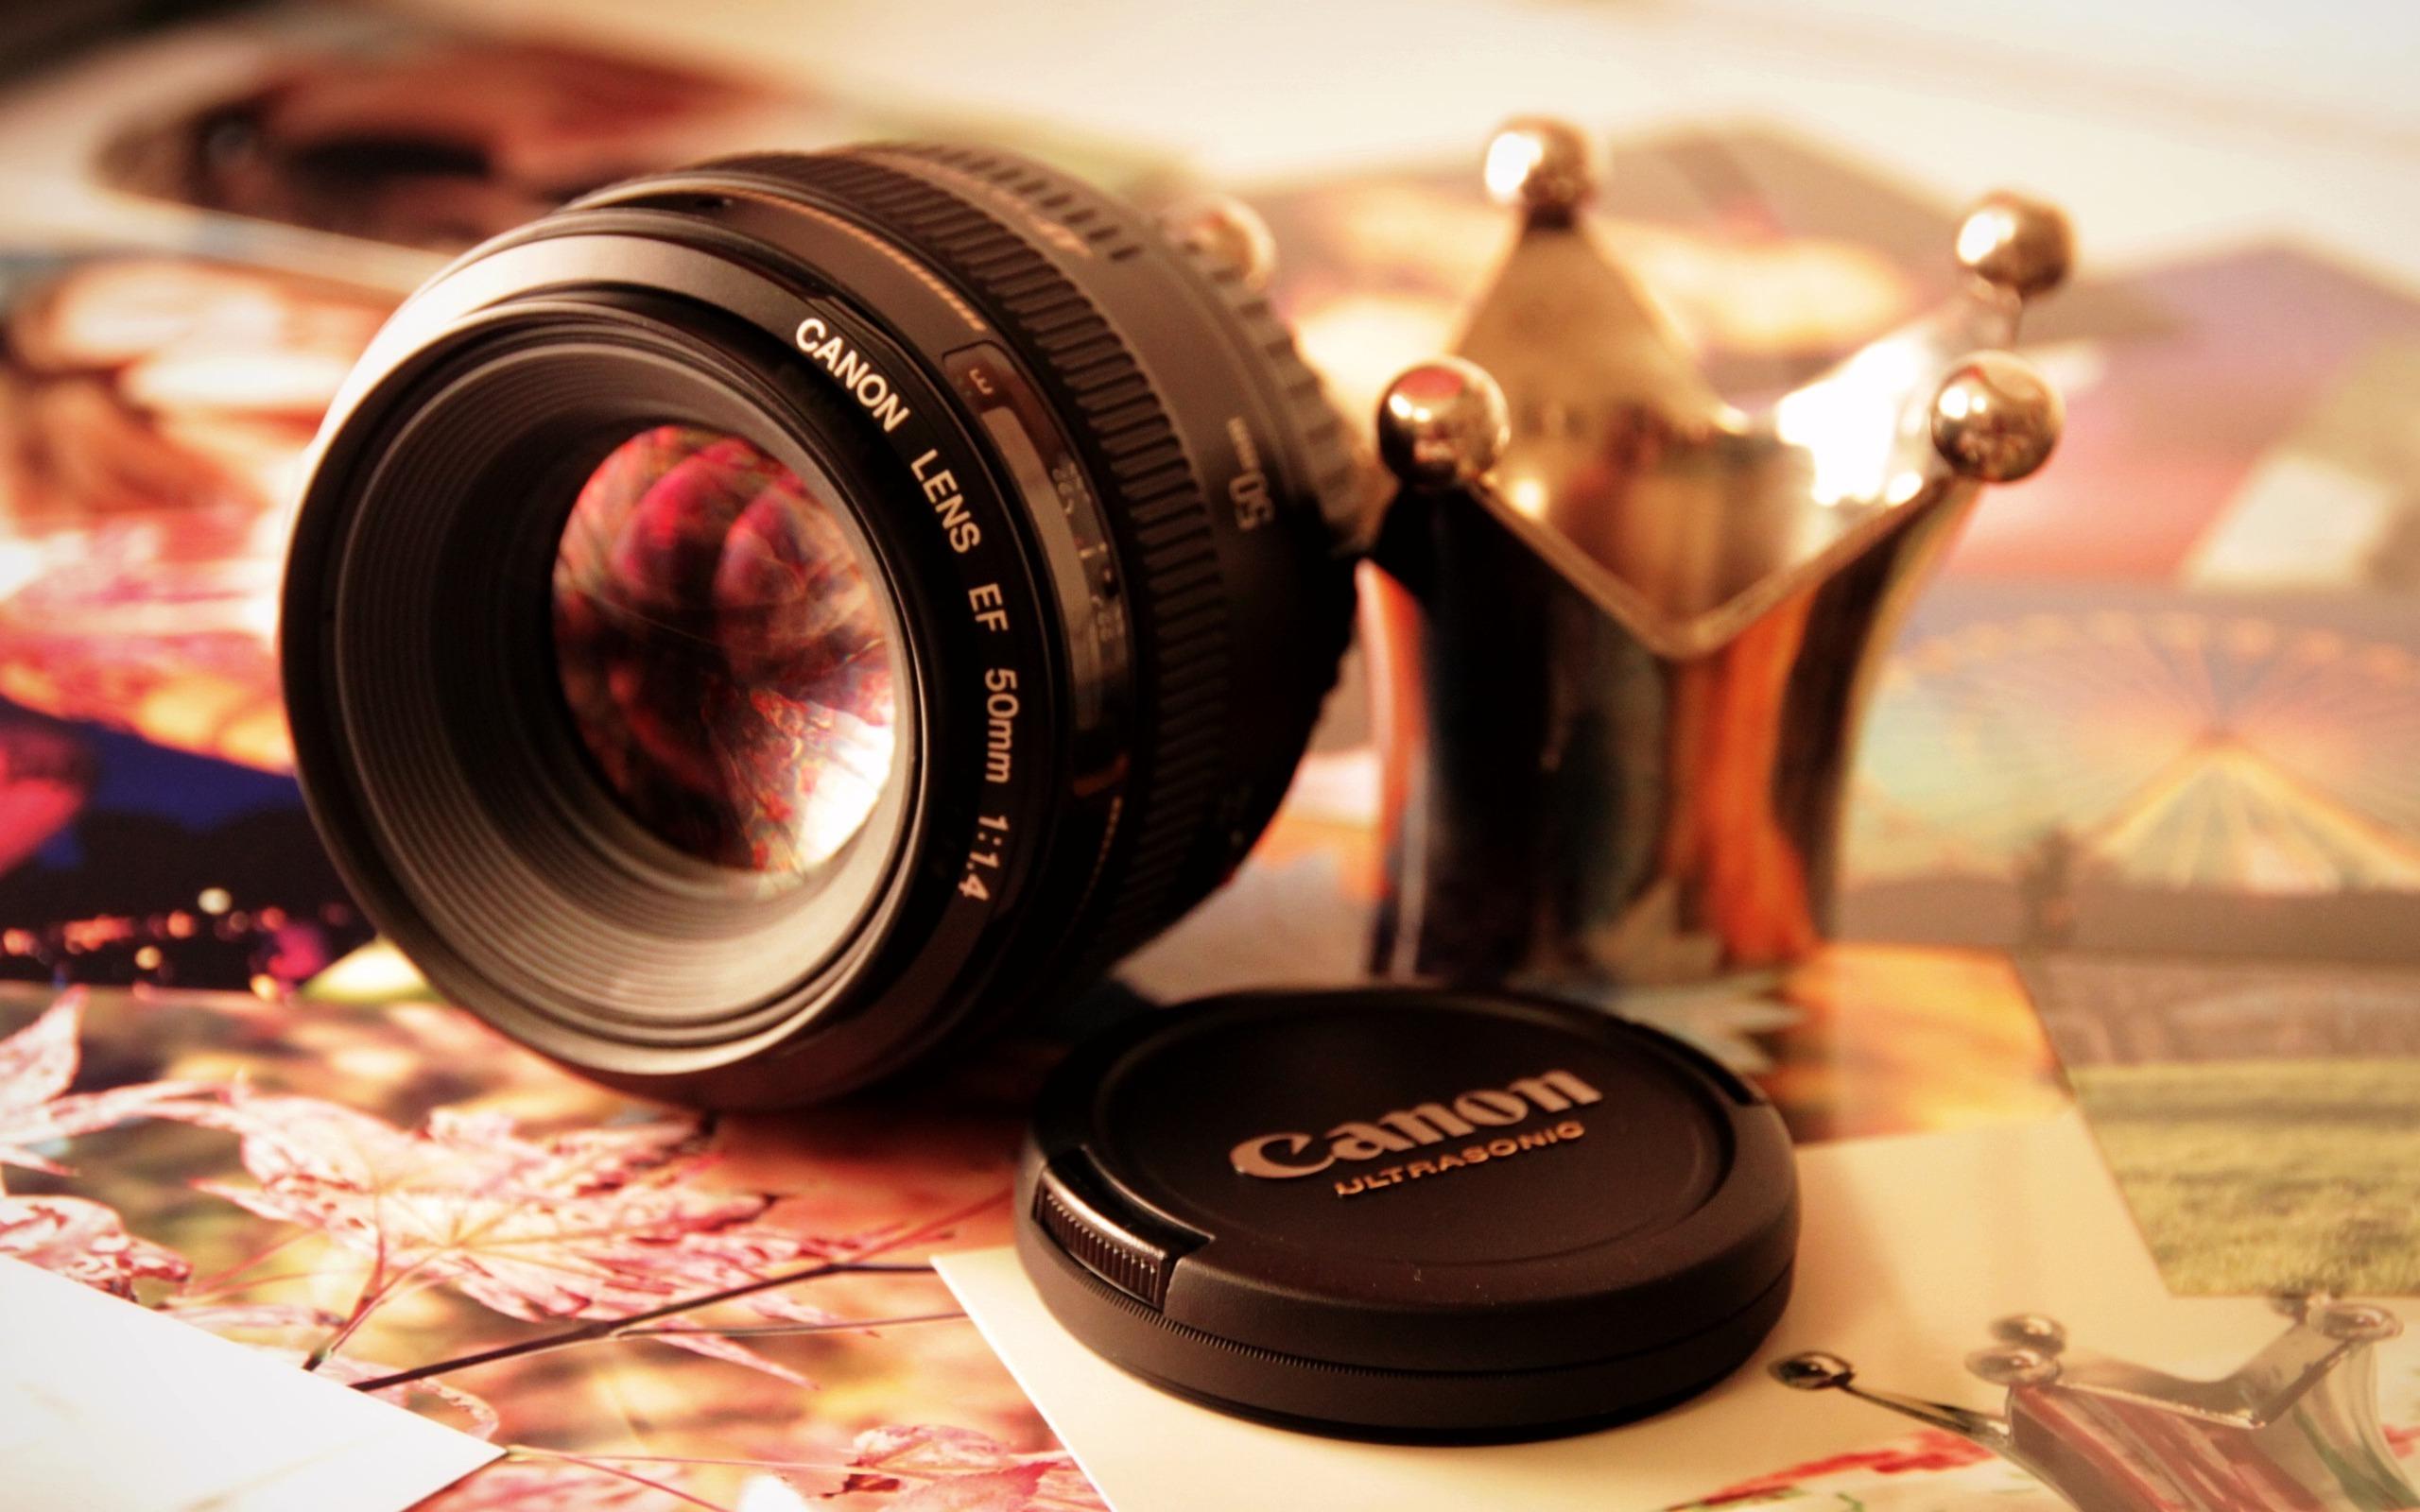 Фотоаппарат Nikon старый  № 3624464 бесплатно